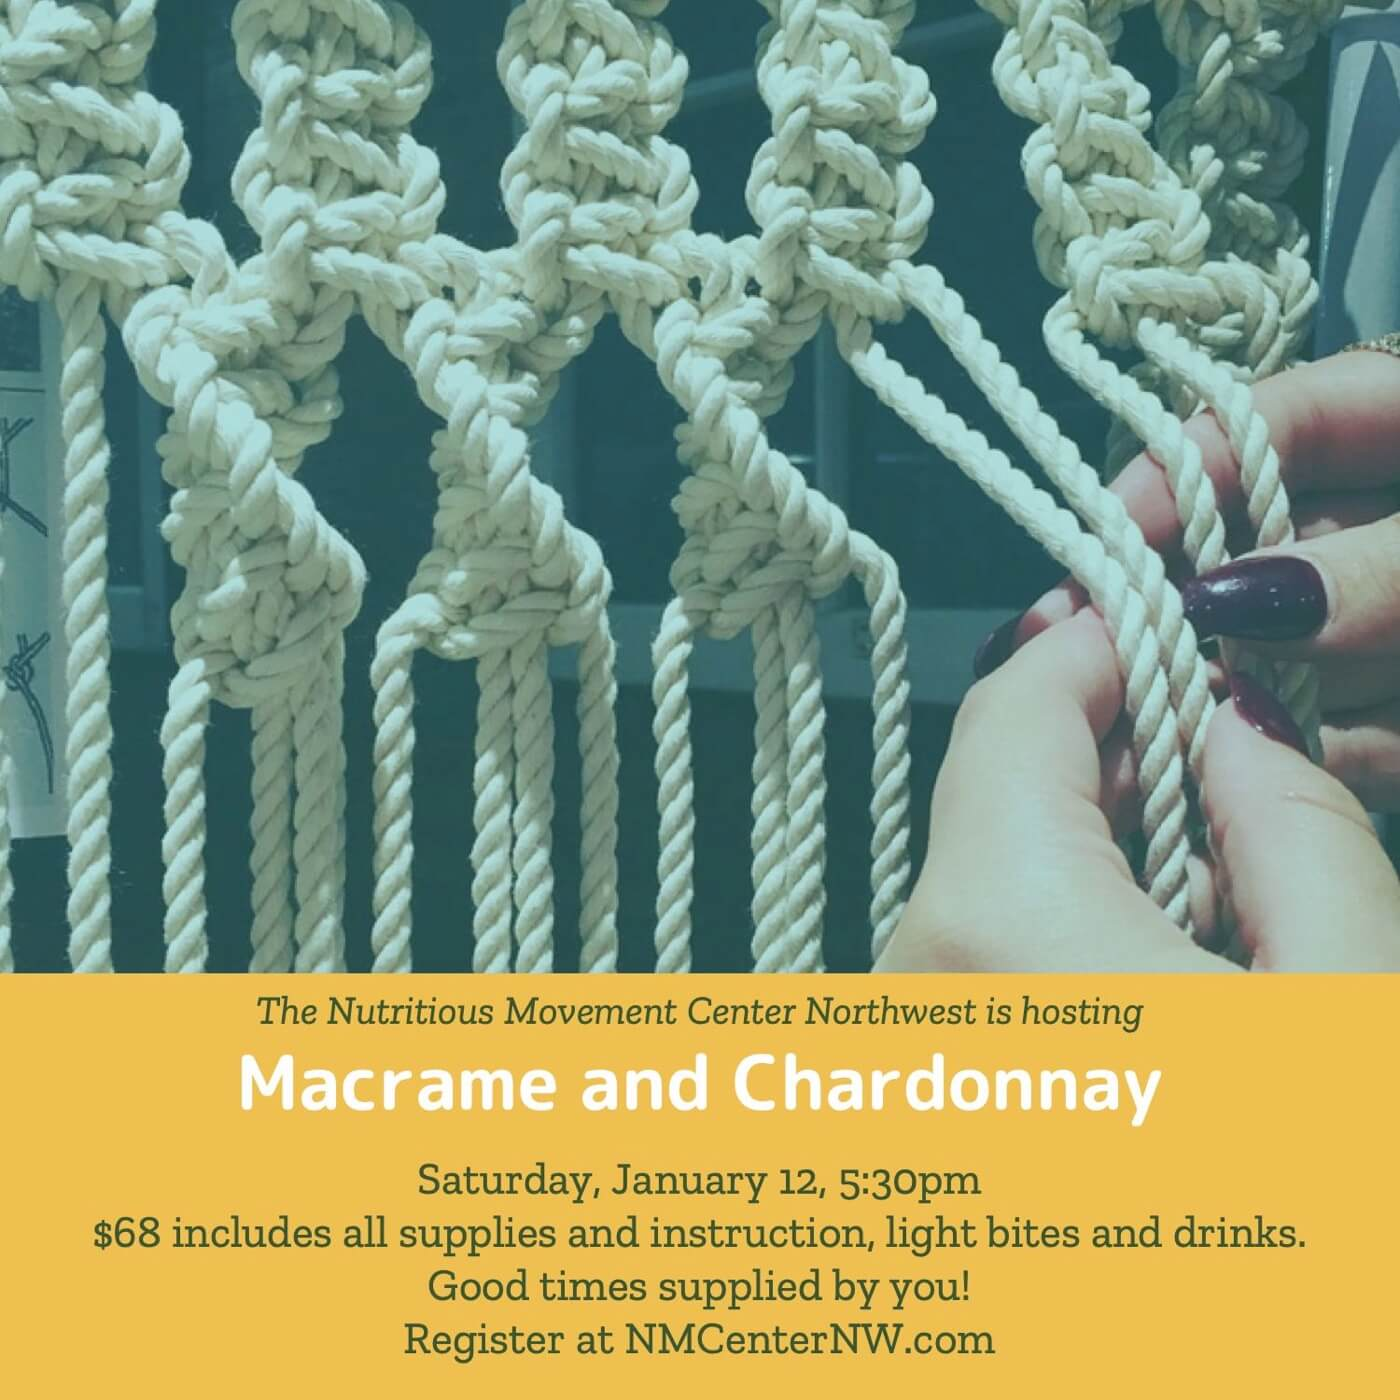 Macrame and Chardonnay